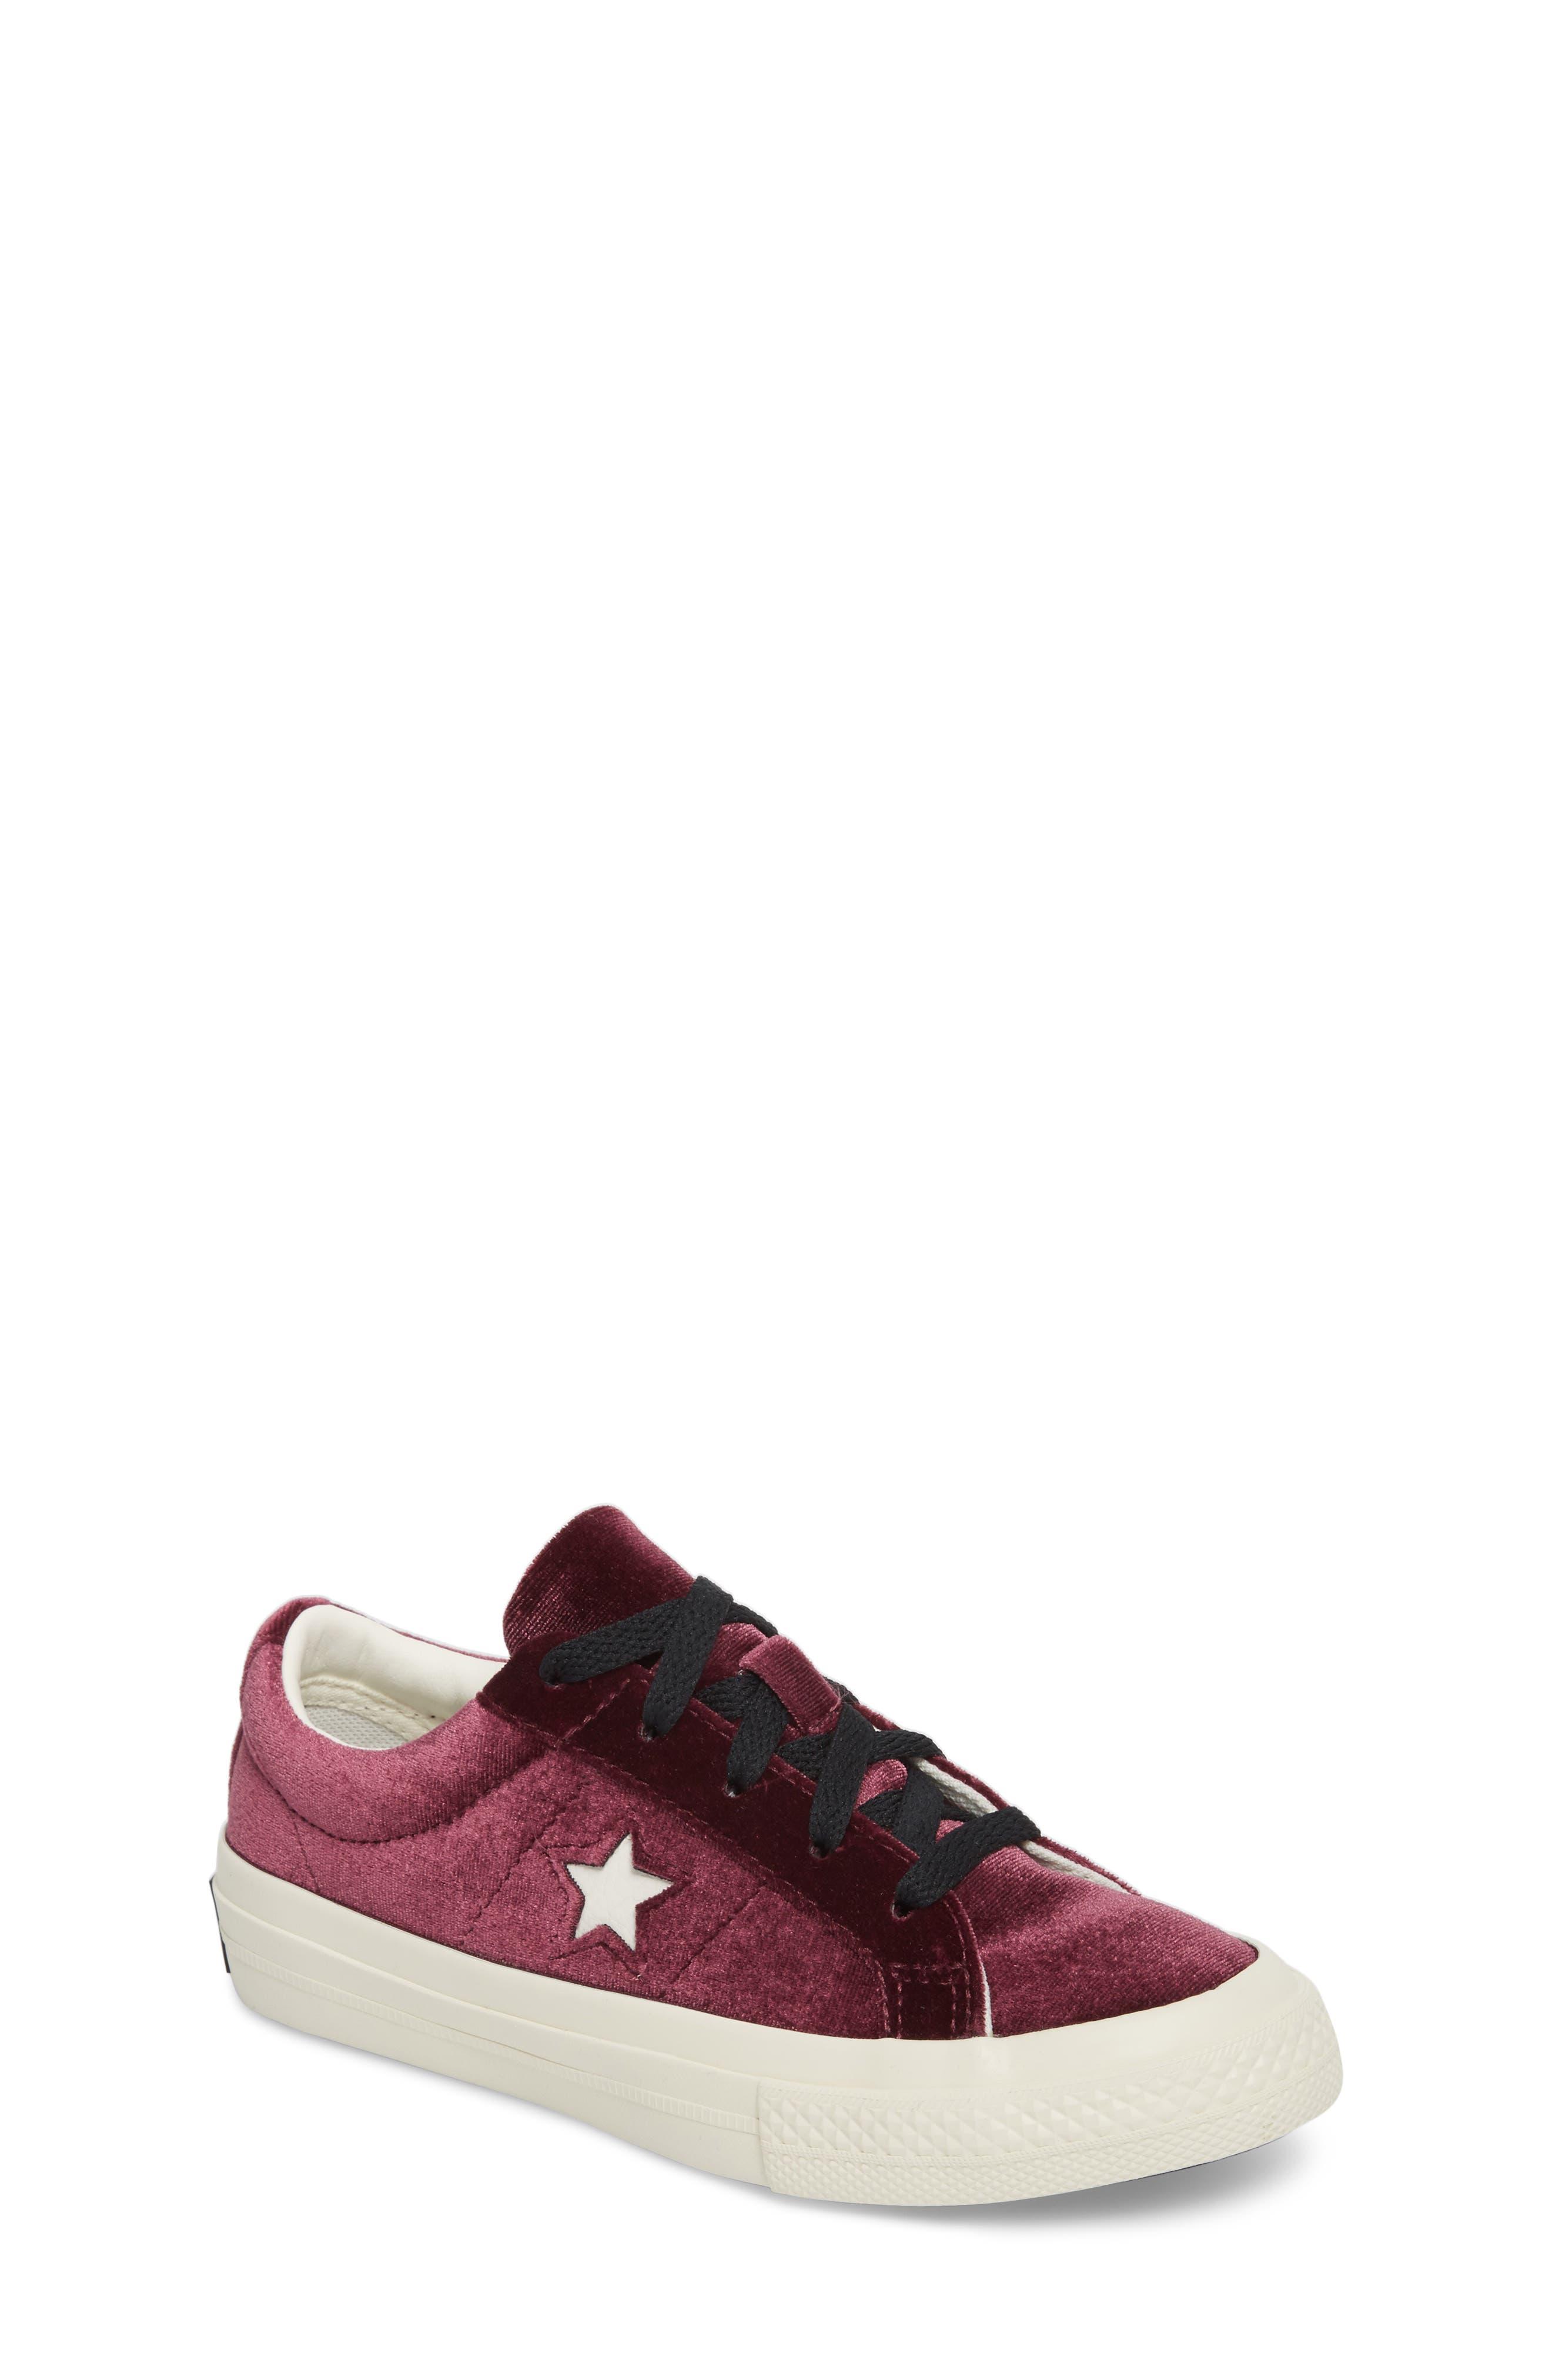 Chuck Taylor<sup>®</sup> All Star<sup>®</sup> One Star Velvet Platform Sneaker,                         Main,                         color, Sangria Velvet